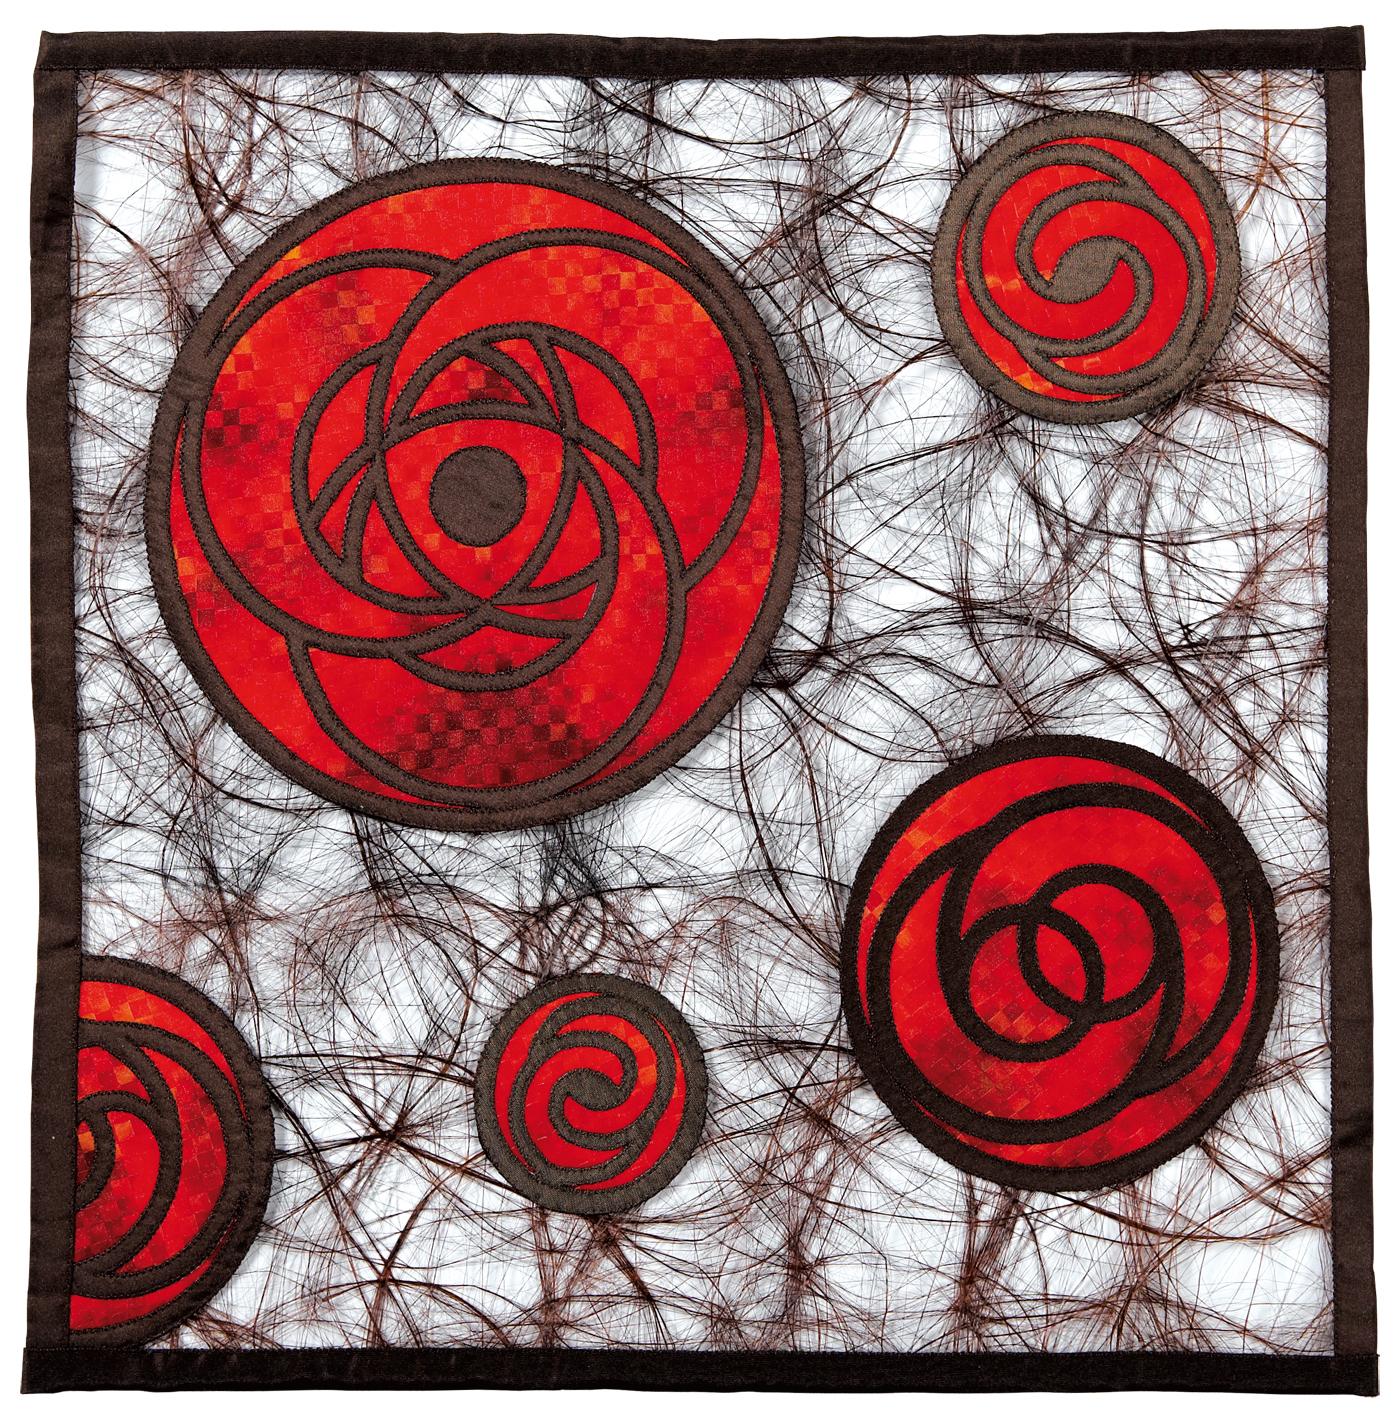 Crop Circles,  de Olga Prins-Lukowski (NL),2009, 35cm x 35cm